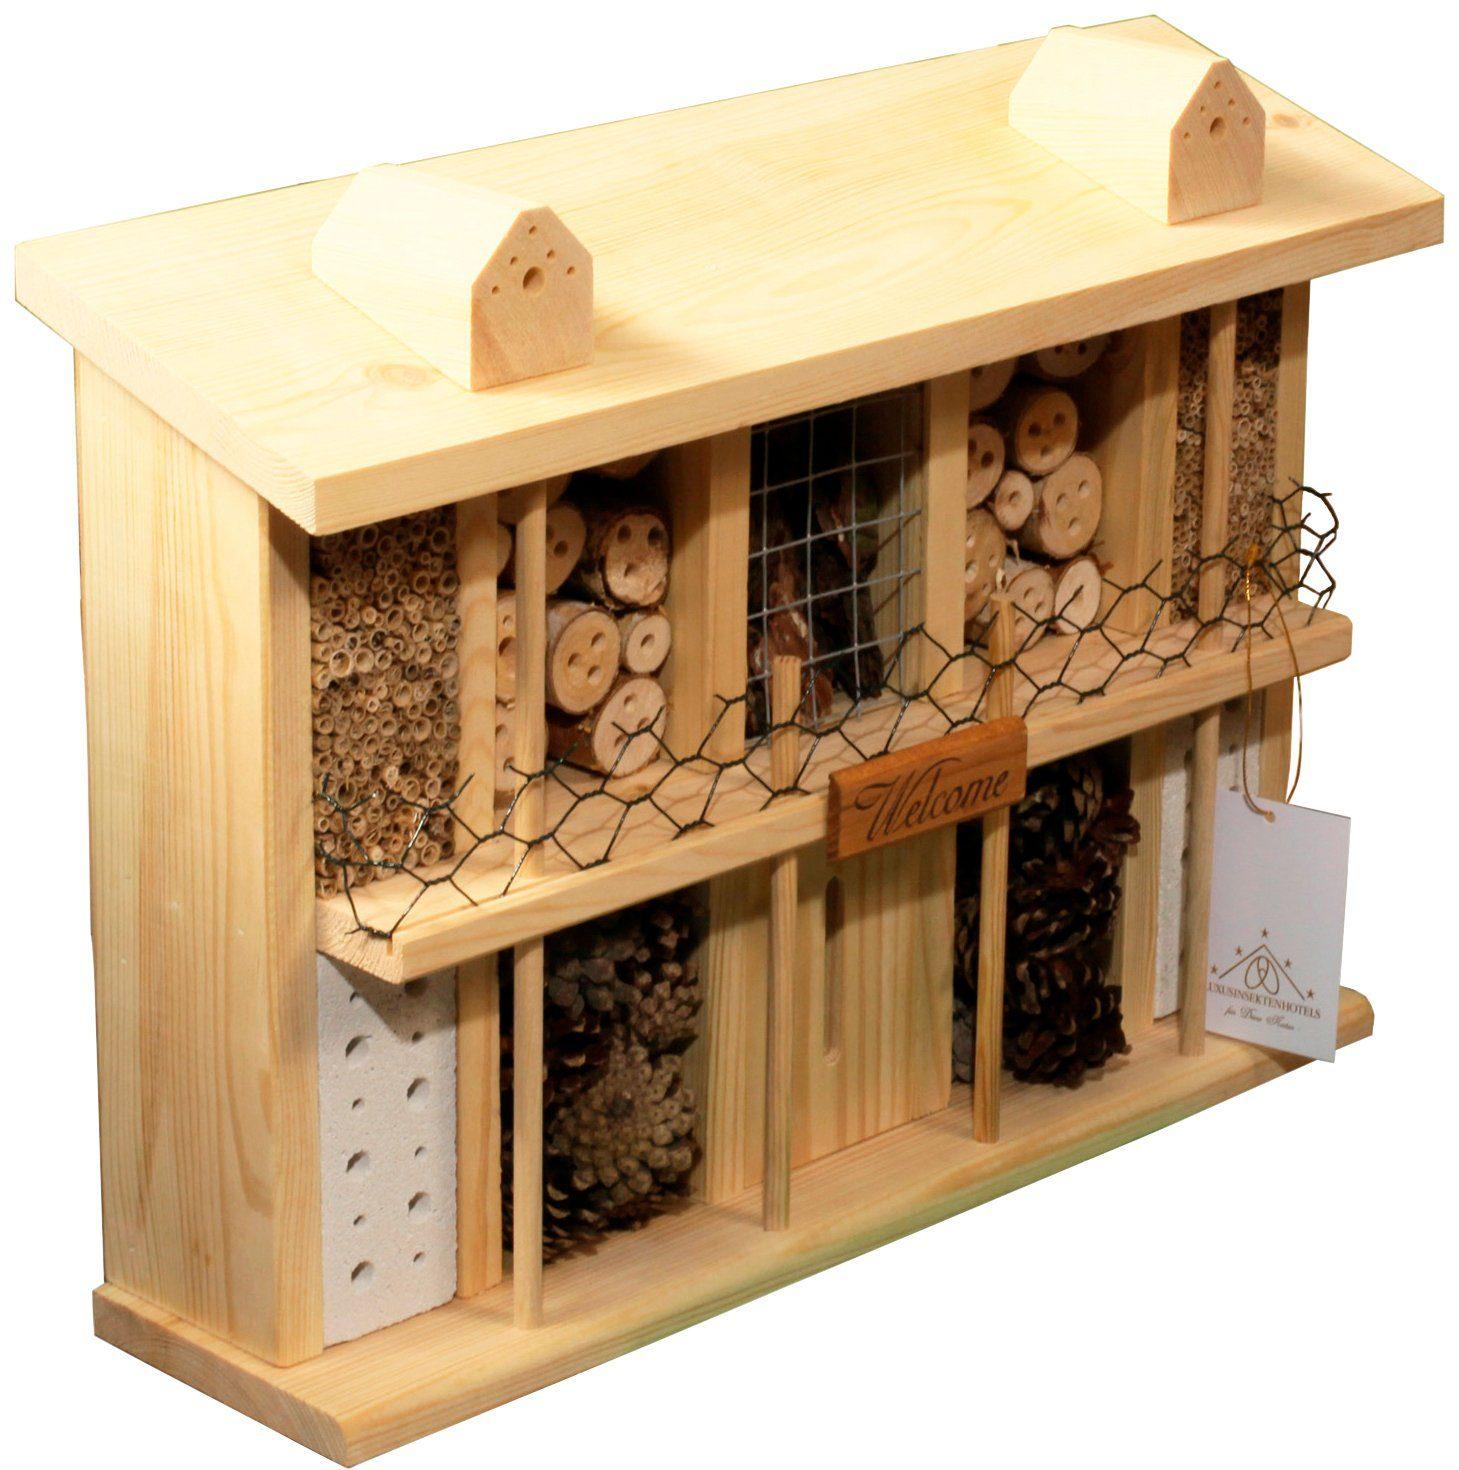 LUXUSINSEKTENHOTELS Insektenhotel »Landsitz Superior«, BxTxH: 47x12,5x34 cm, zur Selbstmontage